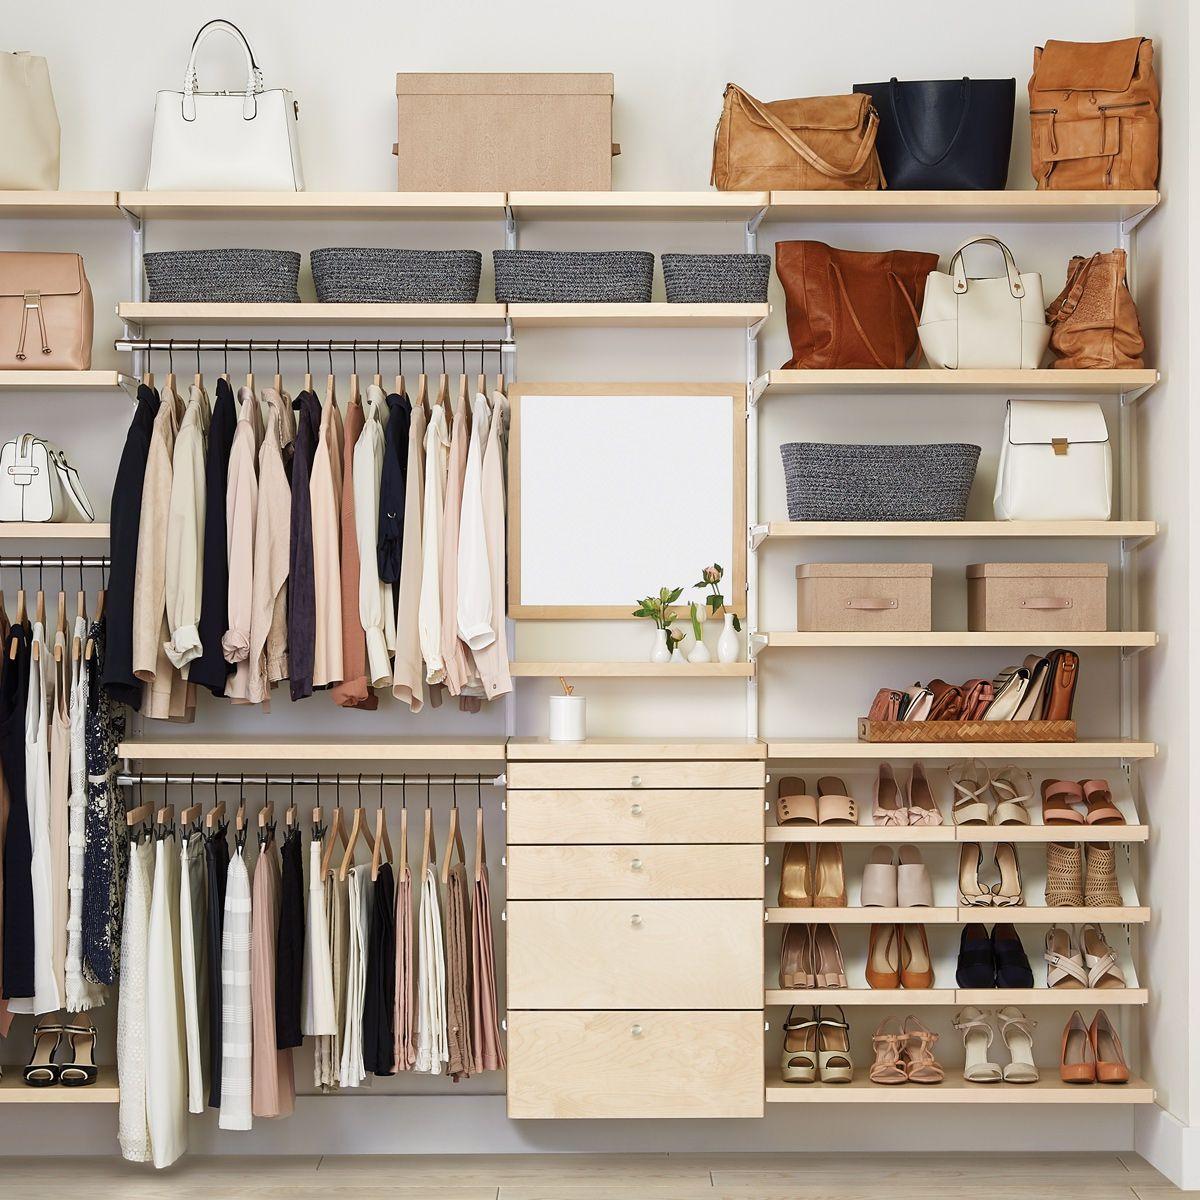 Getting dressed just got more fun! Design a custom closet solution